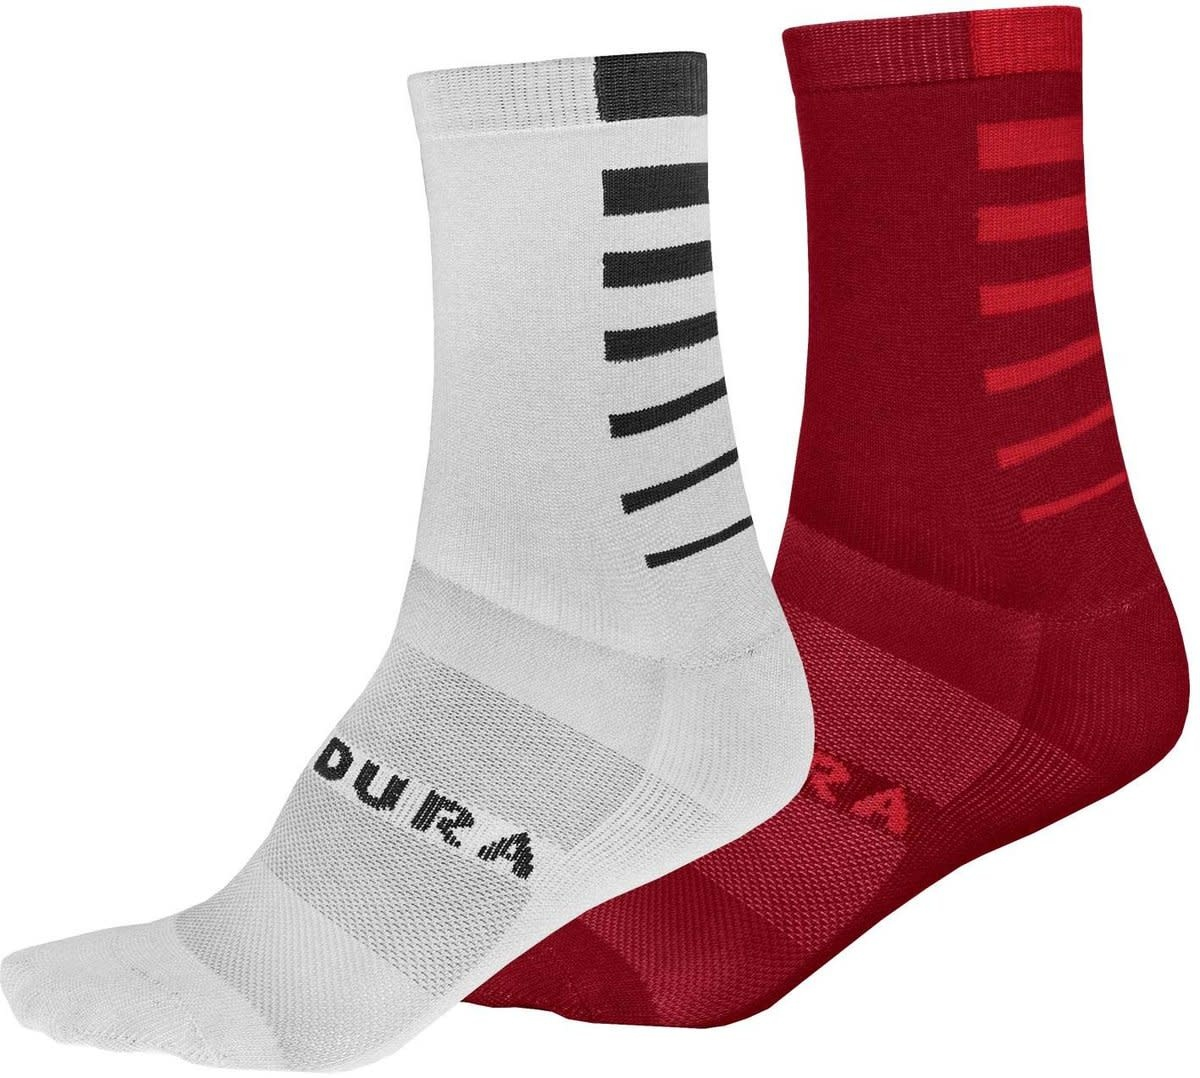 Bas Endura Coolmax Stripe - 2 paires : Rouge & Blanc